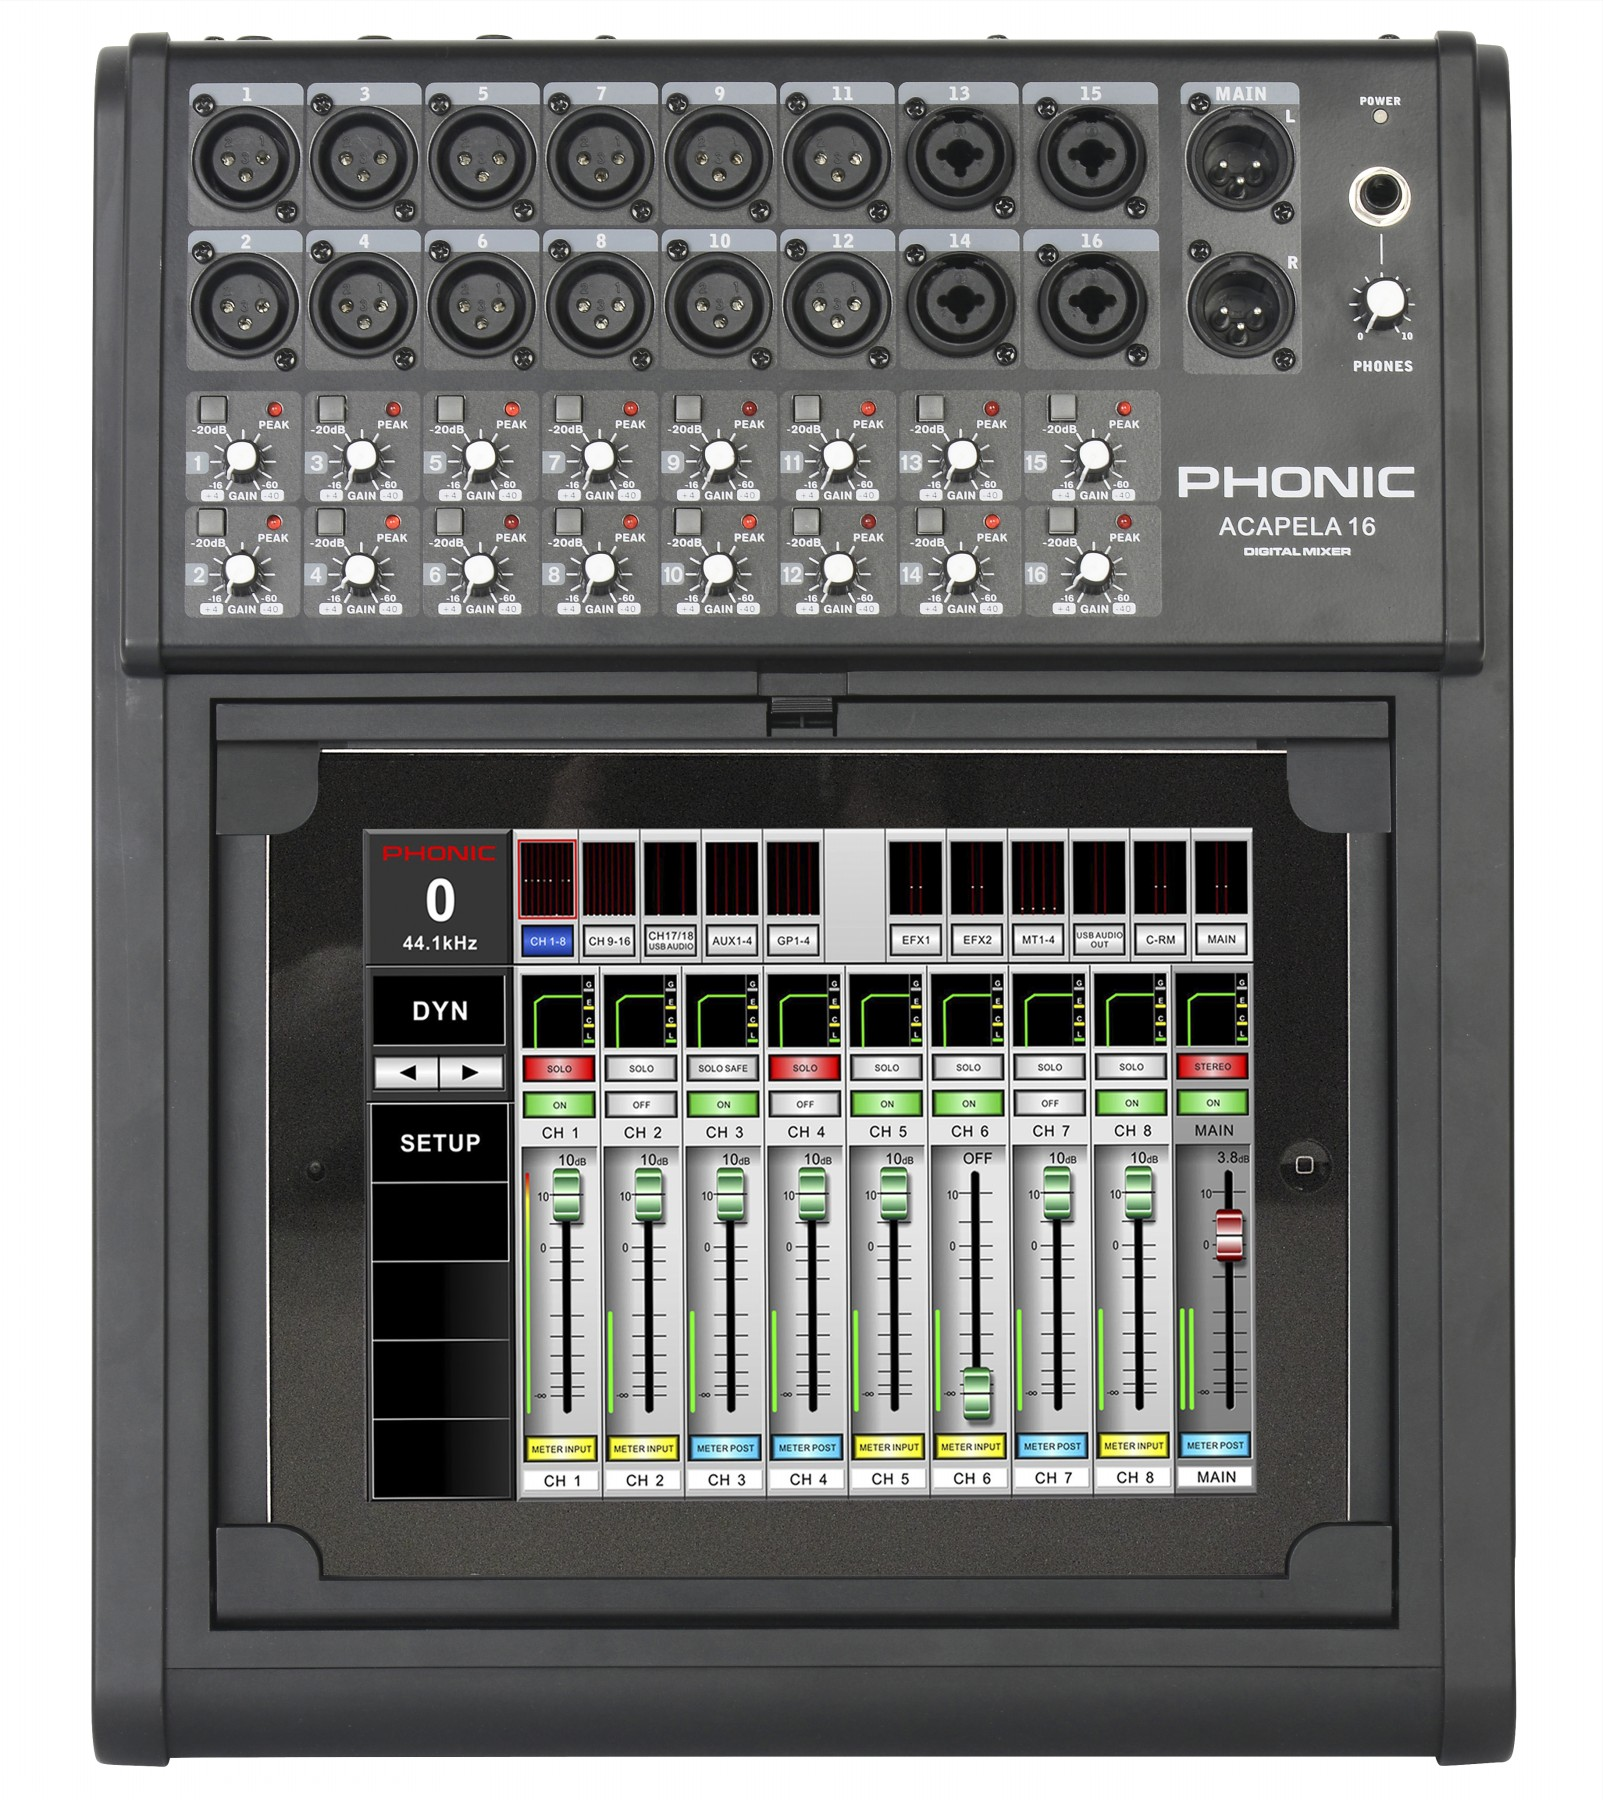 phonic acapela 16数字调音台